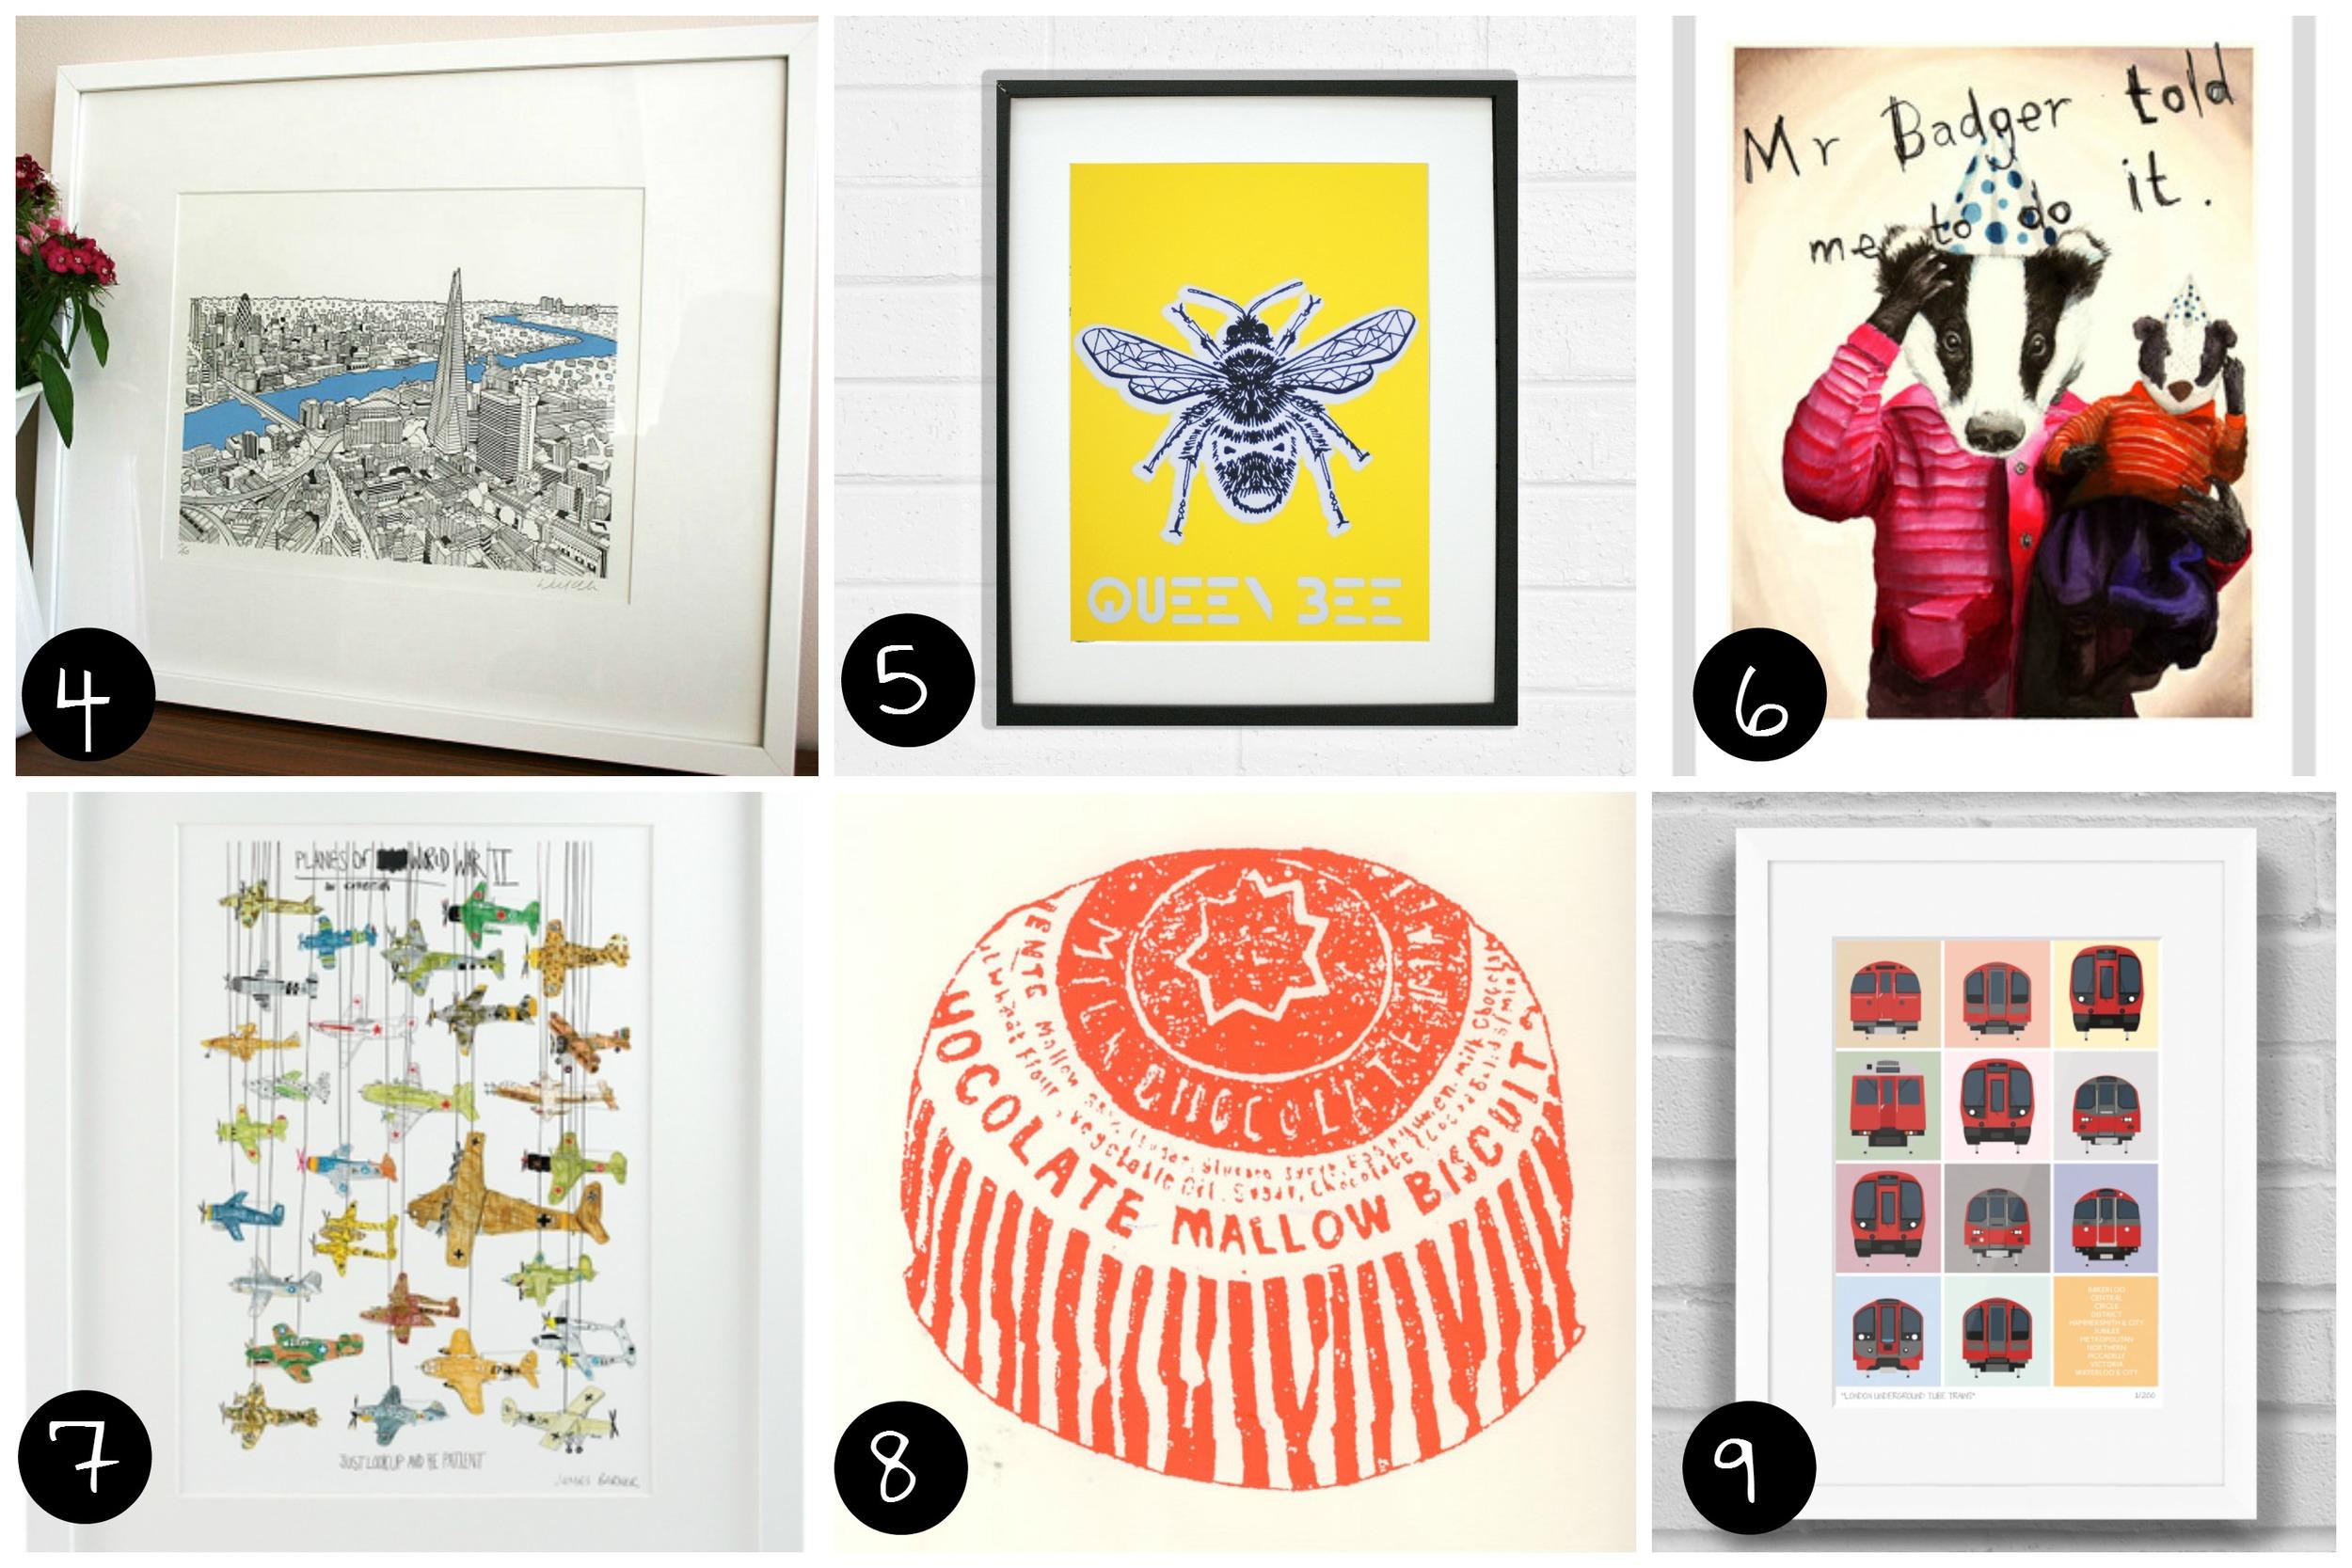 4.  Will Clarke (Peckham - Sun 14 Dec), 5.  Ginger Line Designs (Dalston - Sat 29 Nov) 6.  Jimbobart  (All 6 dates) 7.  Chá com Letras  (Dalston - Sat 29 Nov), 8.  Charlotte Farmer  (Peckham - Sat 13 Dec), 9.  Place in Print  (Peckham - Sun 14 Dec)